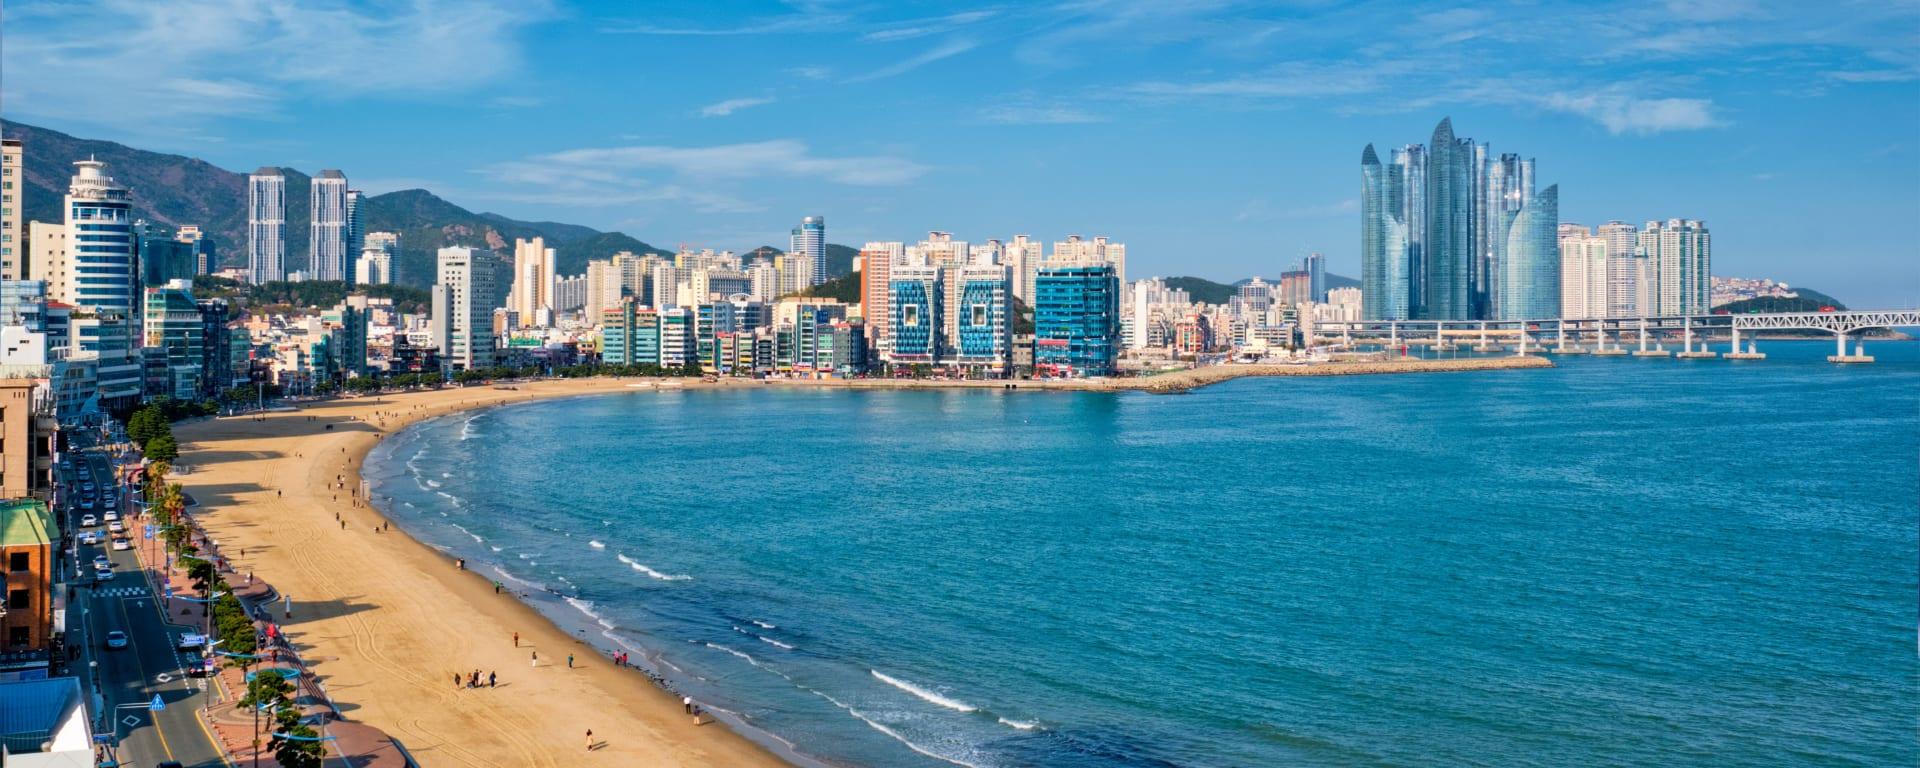 Südkorea individuell mit dem Zug ab Seoul: Korea Busan Skyline Strand